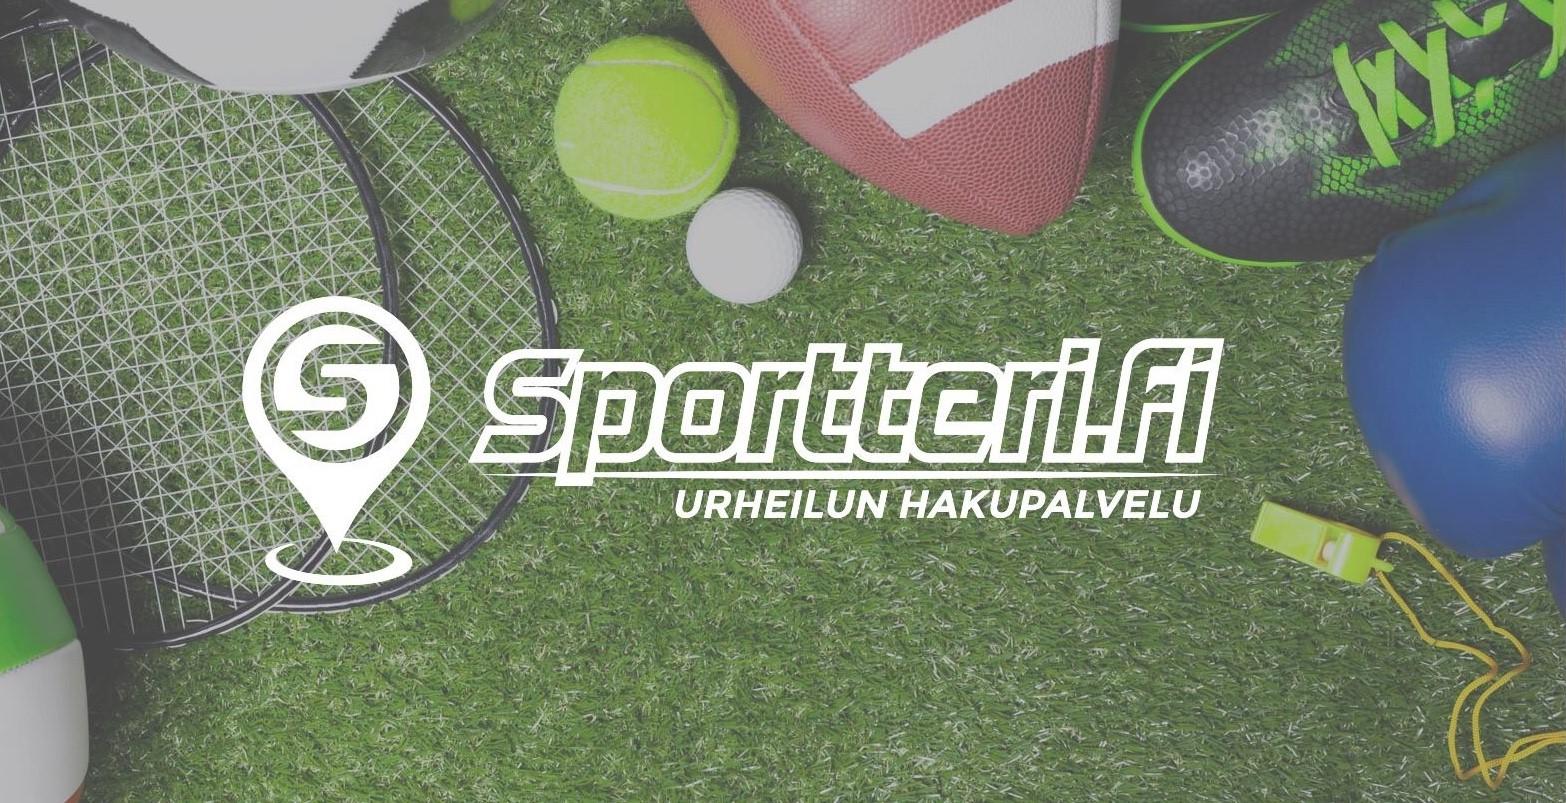 Sportteri.fi